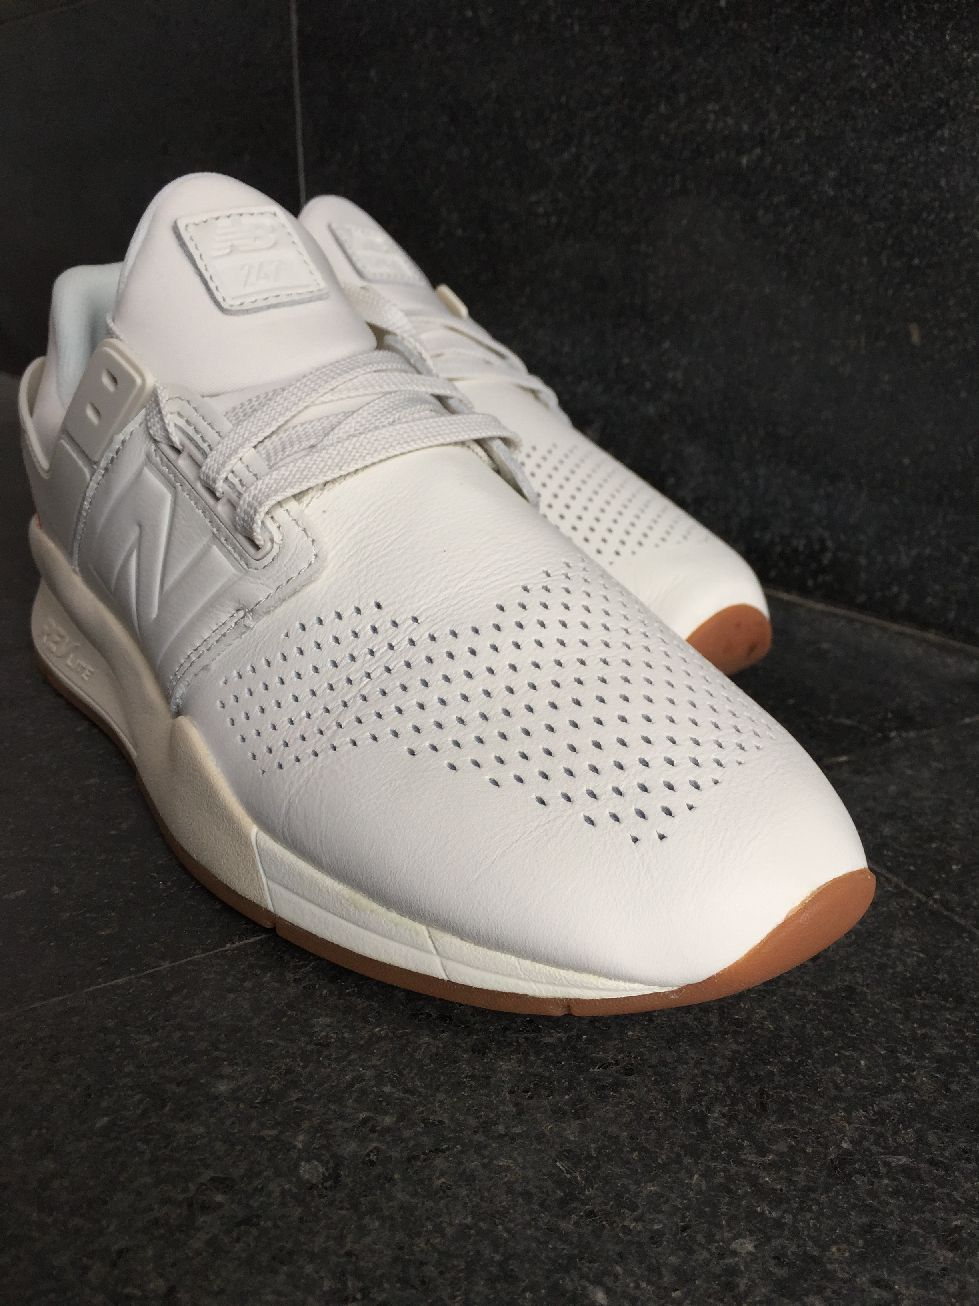 New Balance MS 247 GV Scarpe Sneakers Sportive lifestyle Bianco Pelle Uomo 75ff410e9bd